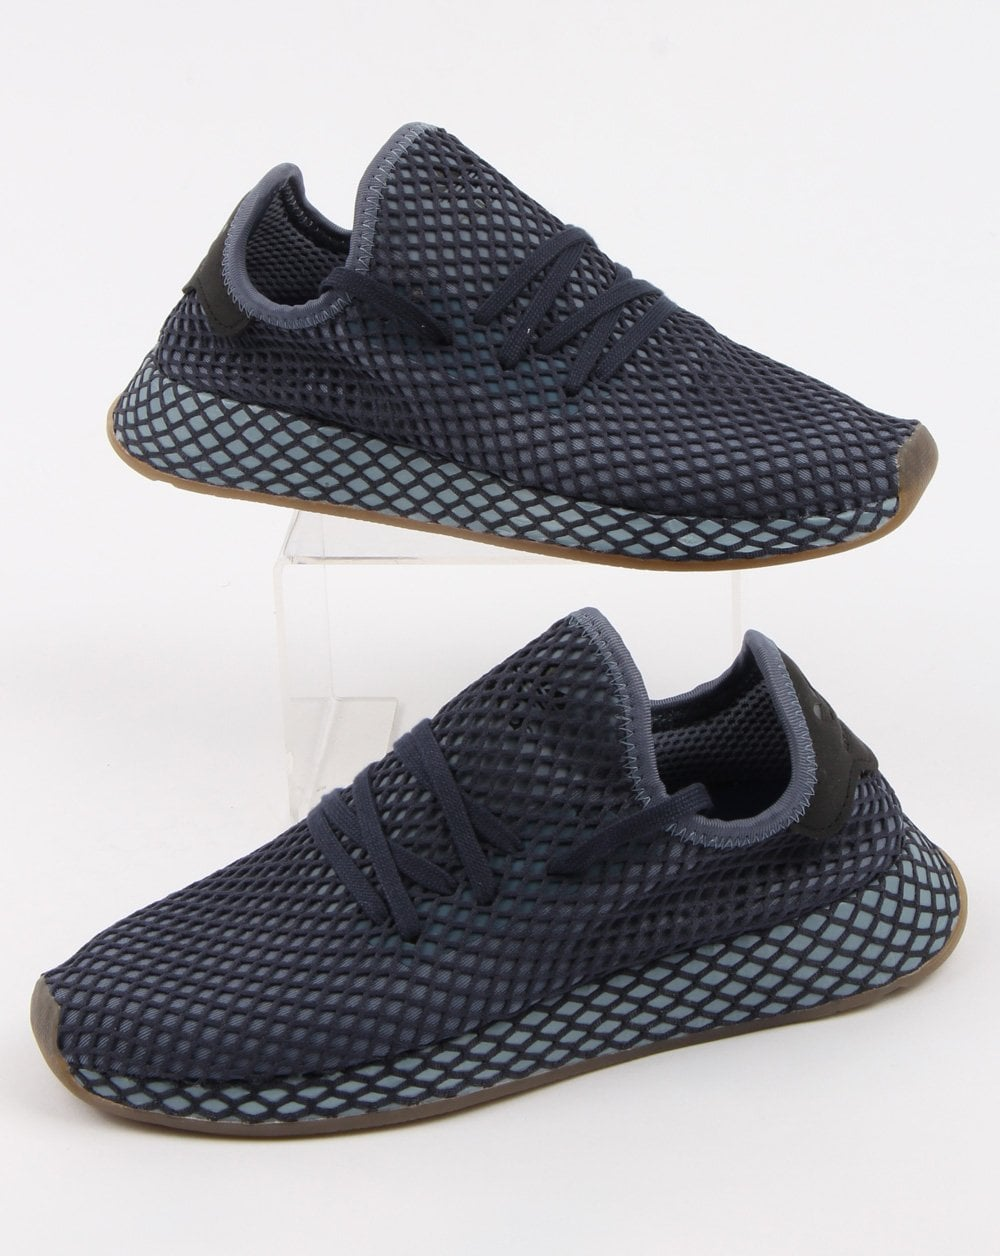 online retailer b3d6b 225b7 Adidas Deerupt Runner Trainers Dark Blueash Blue